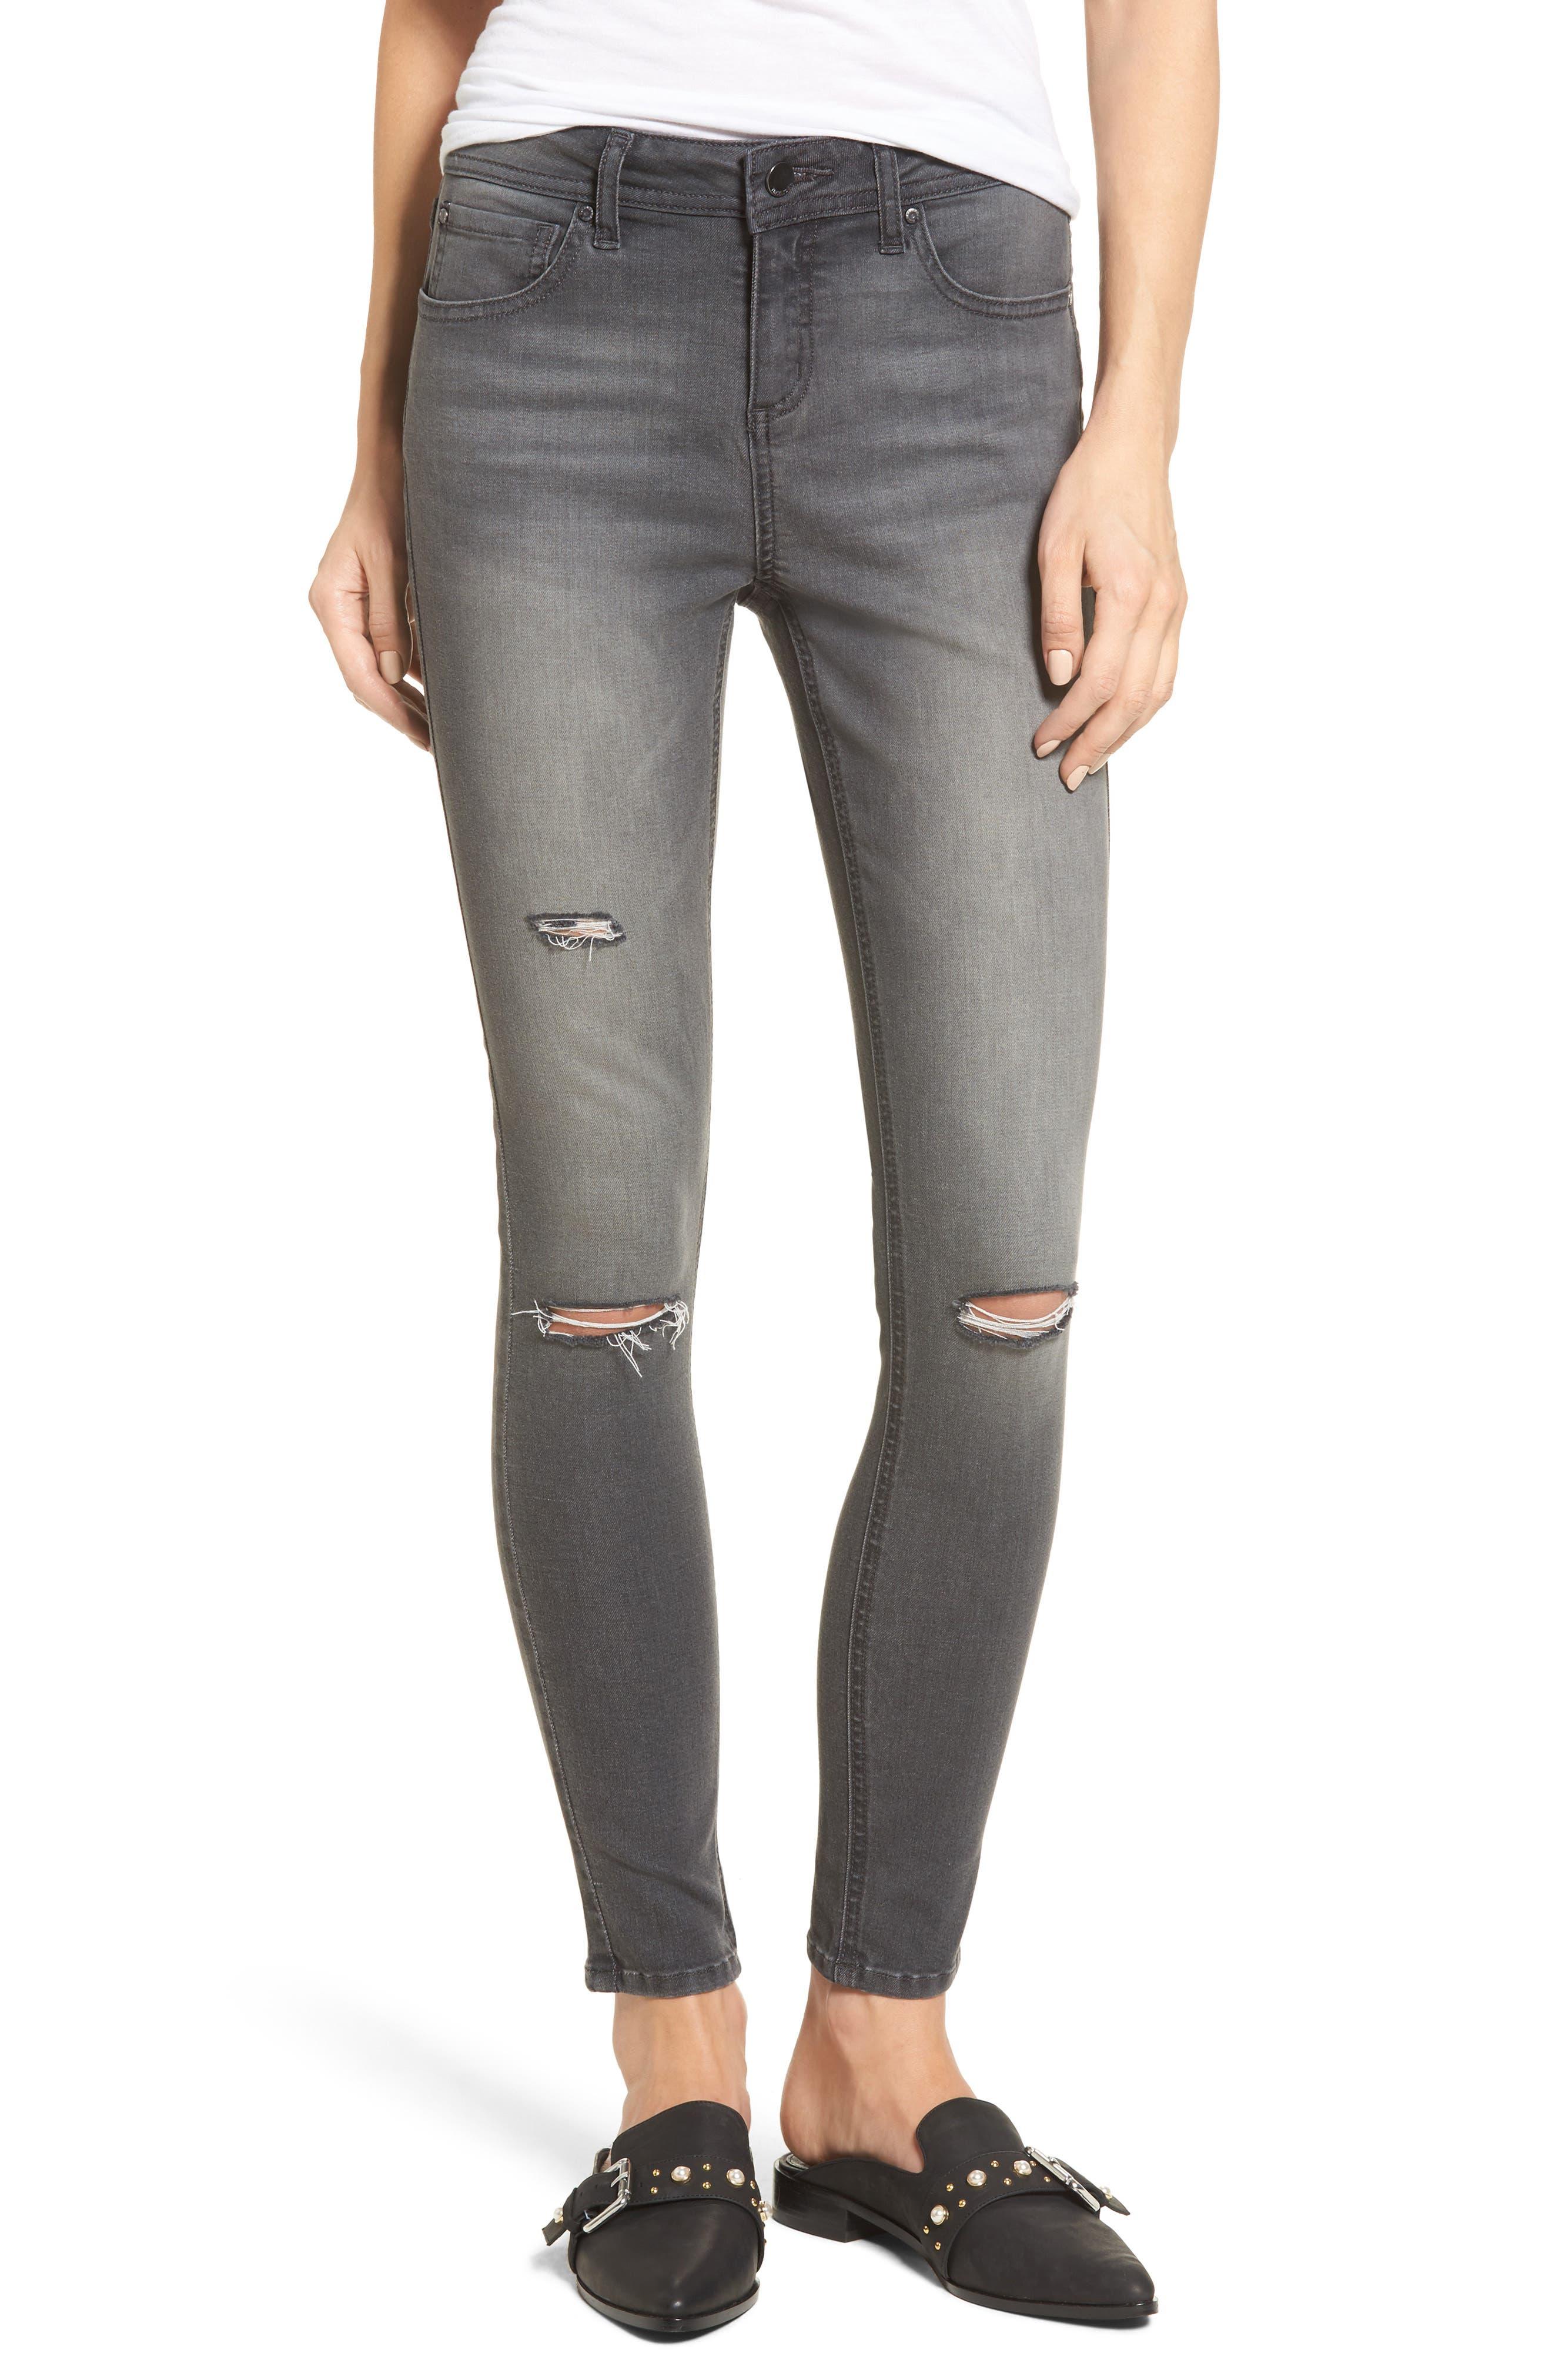 Main Image - Tinsel Ripped Skinny Jeans (Rebelite Charcoal)